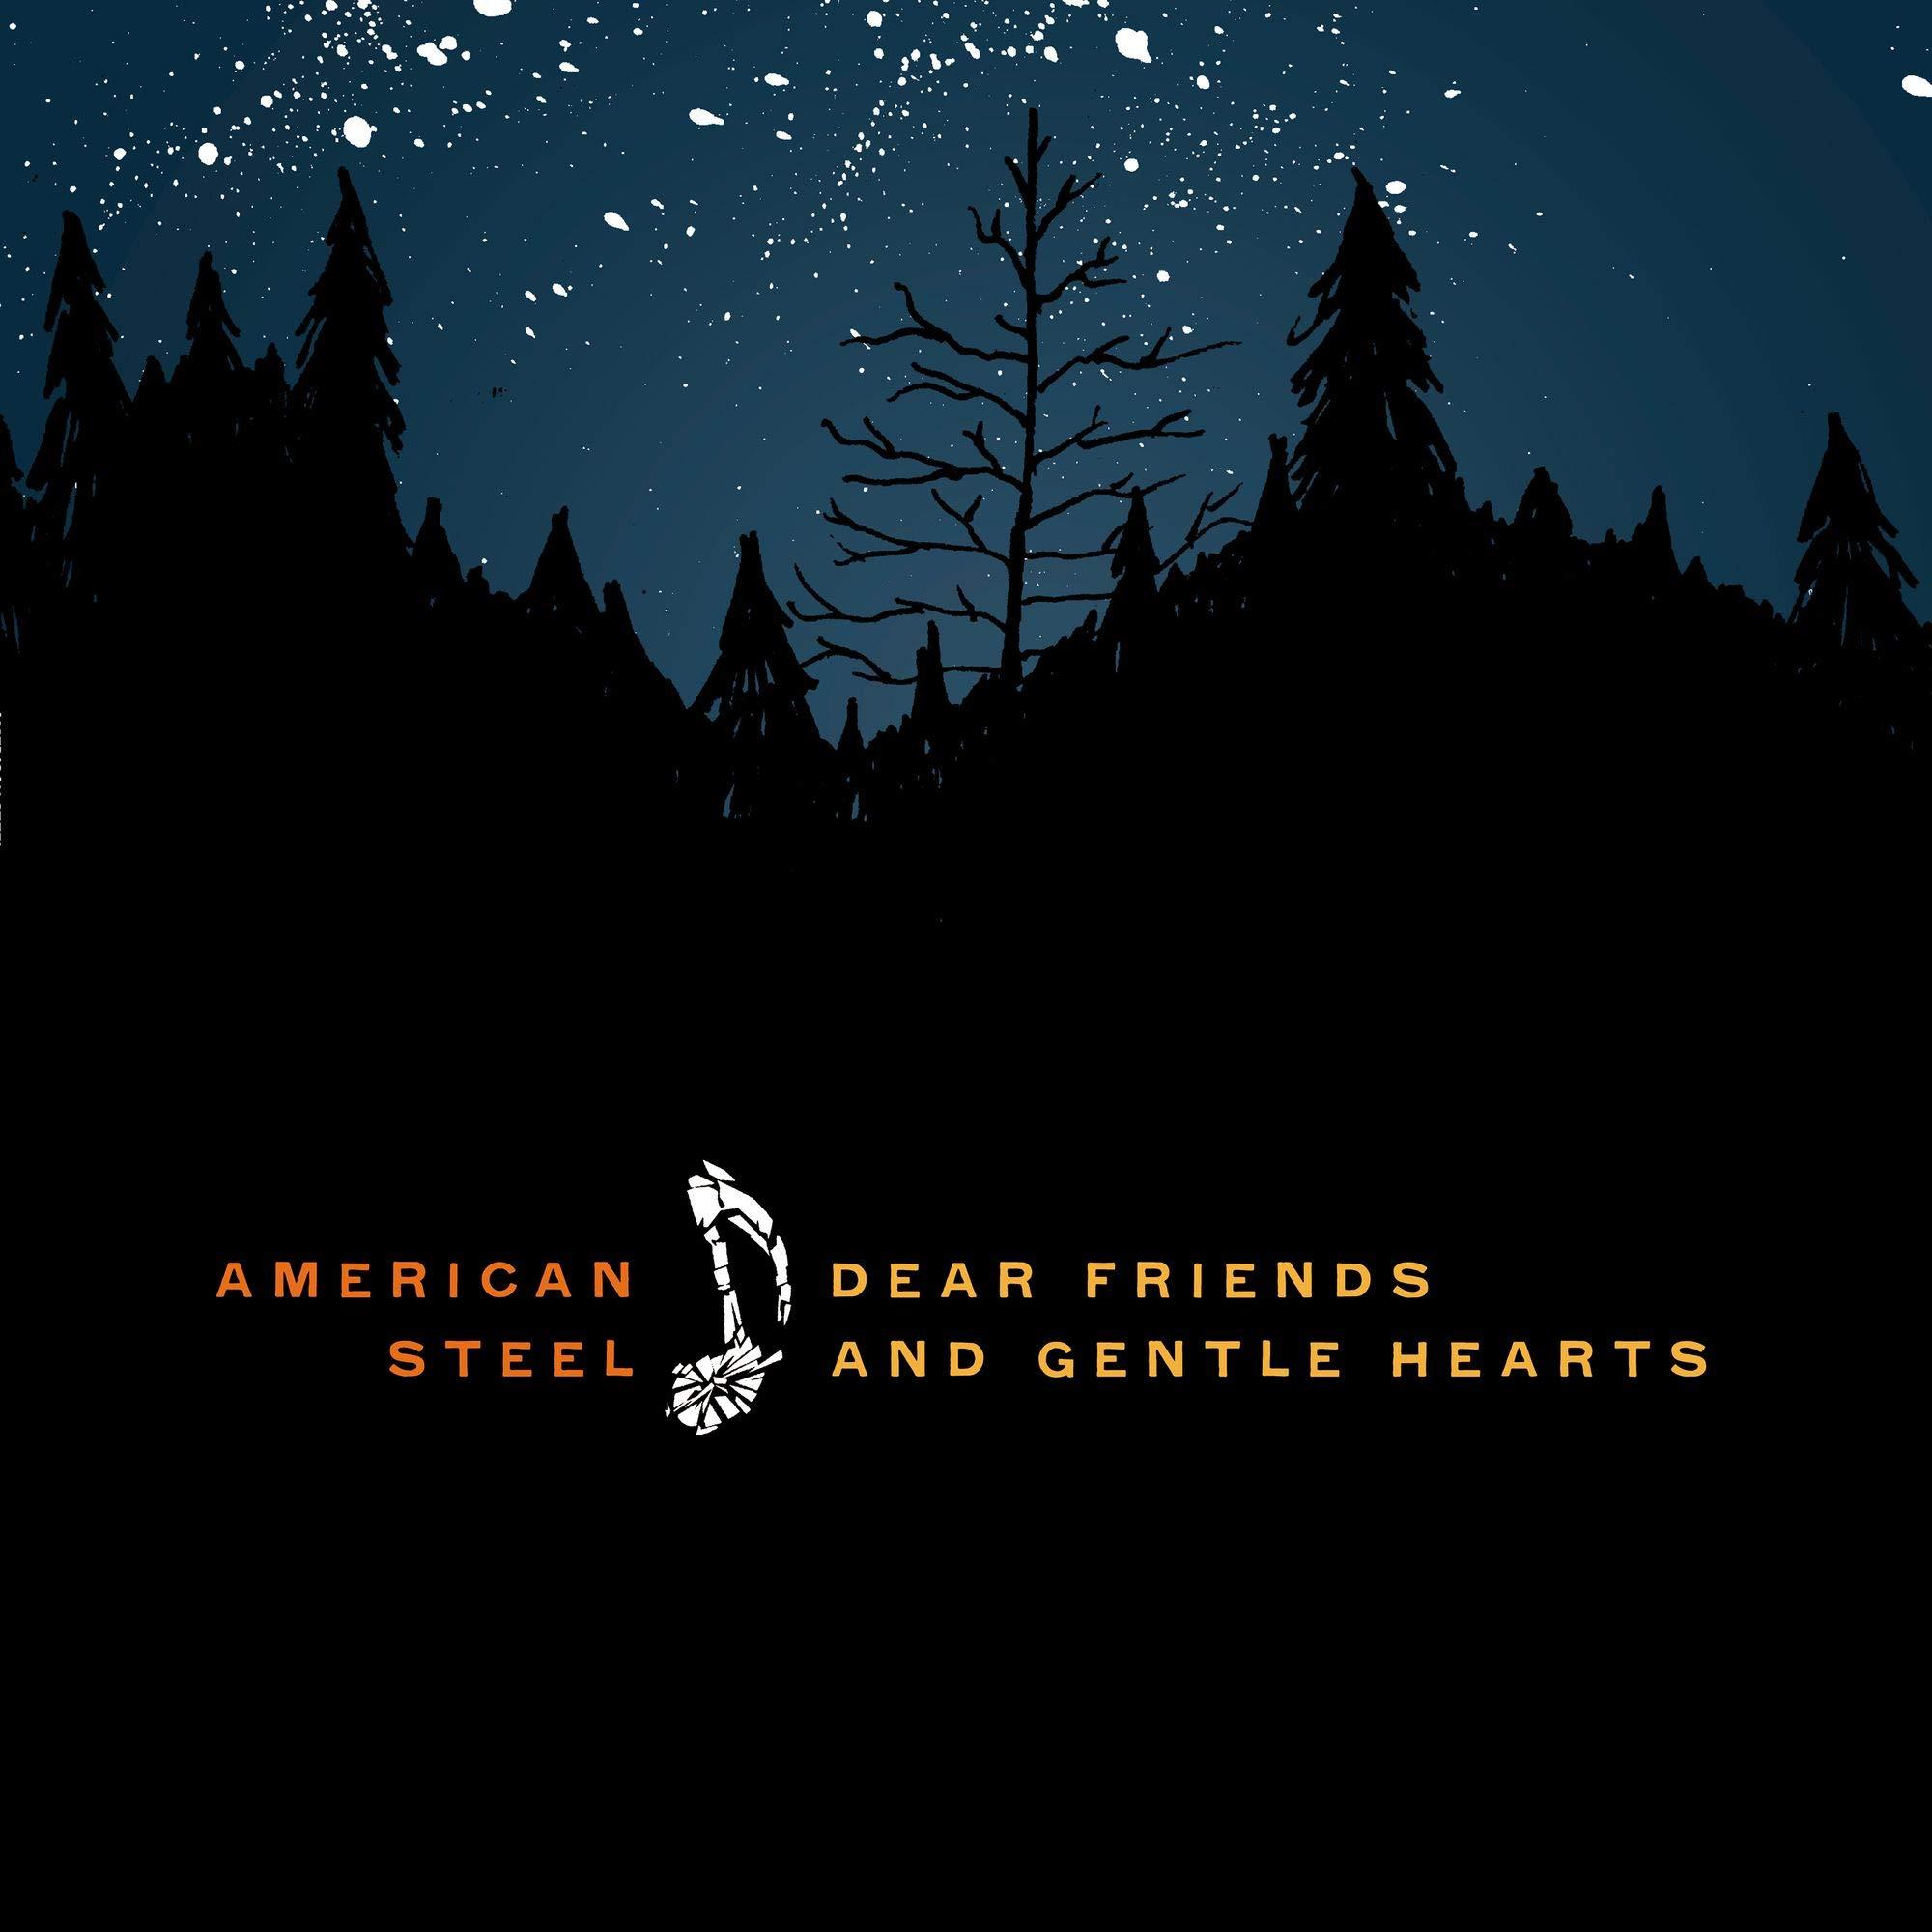 American Steel - Dear Friends and Gentle Hearts (2009) [FLAC] Download